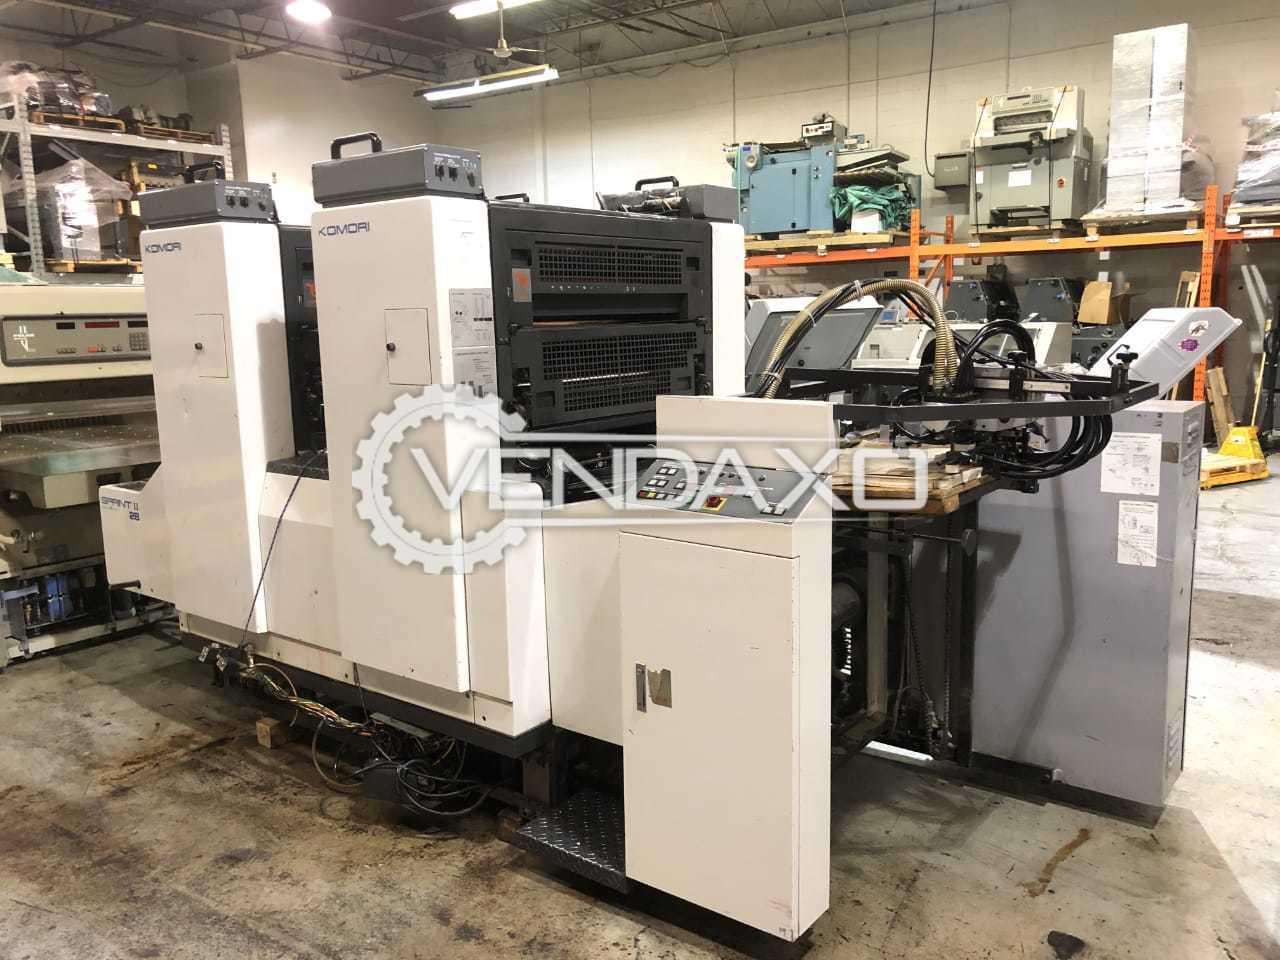 Komori Sprint 228P Offset Printing Machine - 20 x 28 Inch, 2 Color